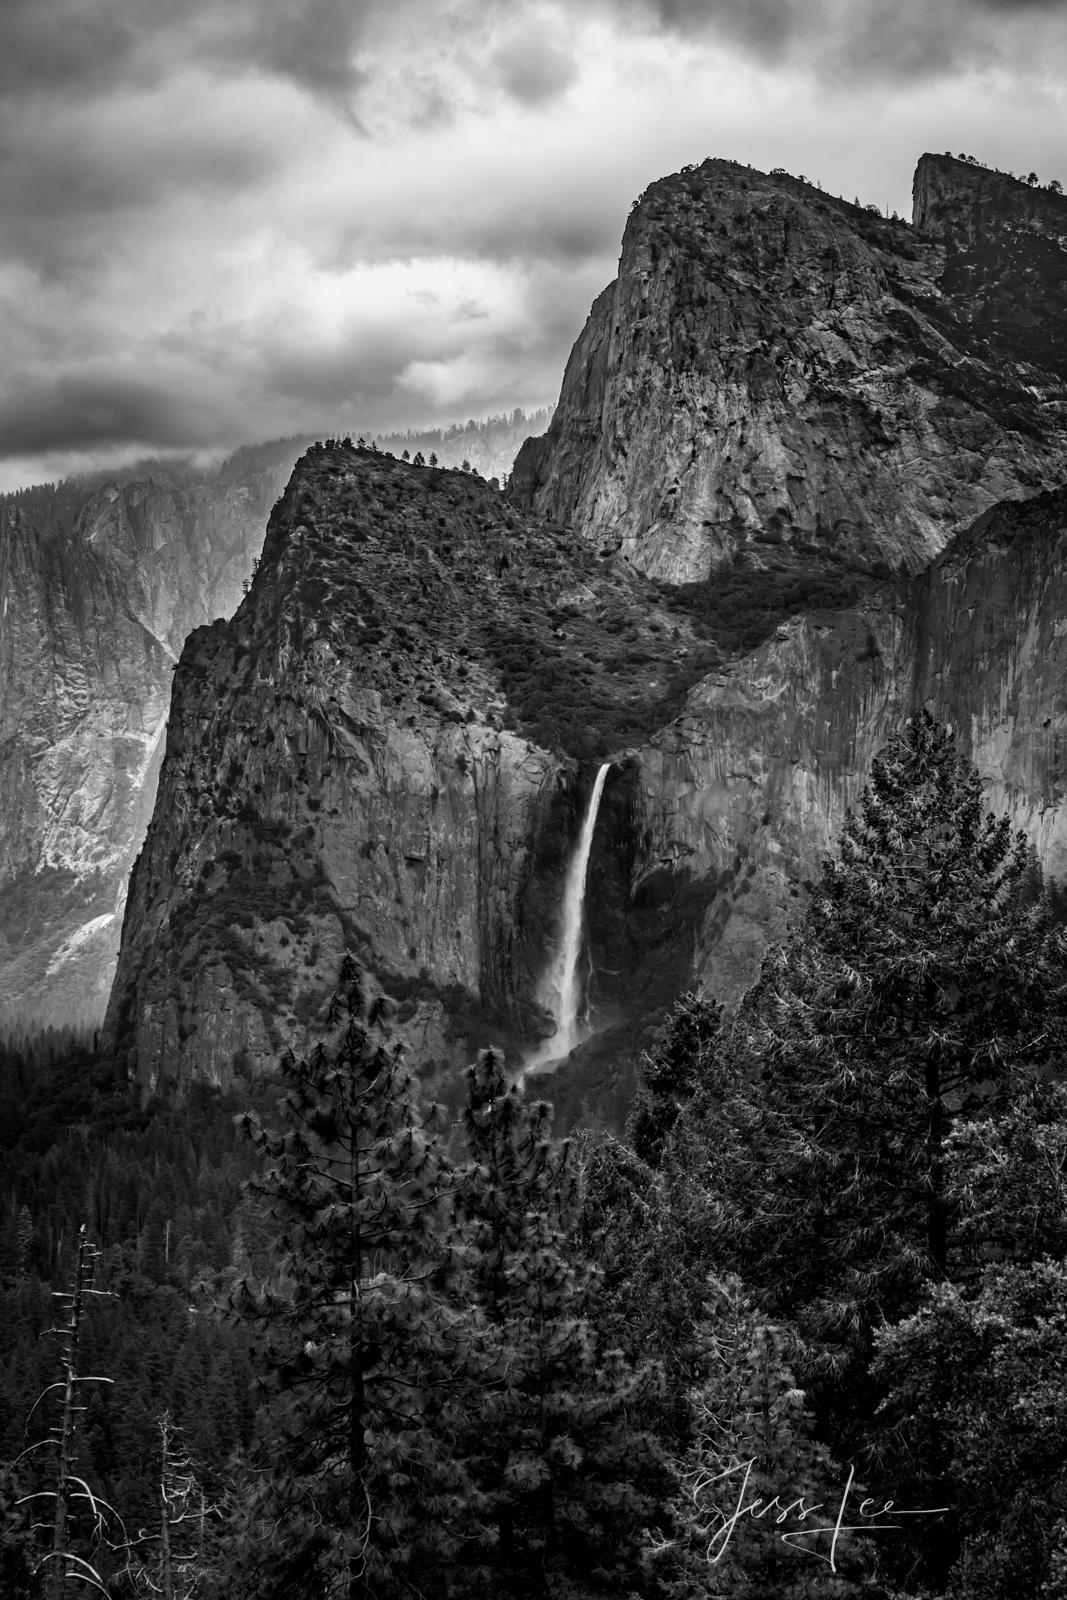 Fine Art Limited Edition Photography Print of Bridalveil Falls Yosemite Valley, California. California Landscape Print of Yosemite...